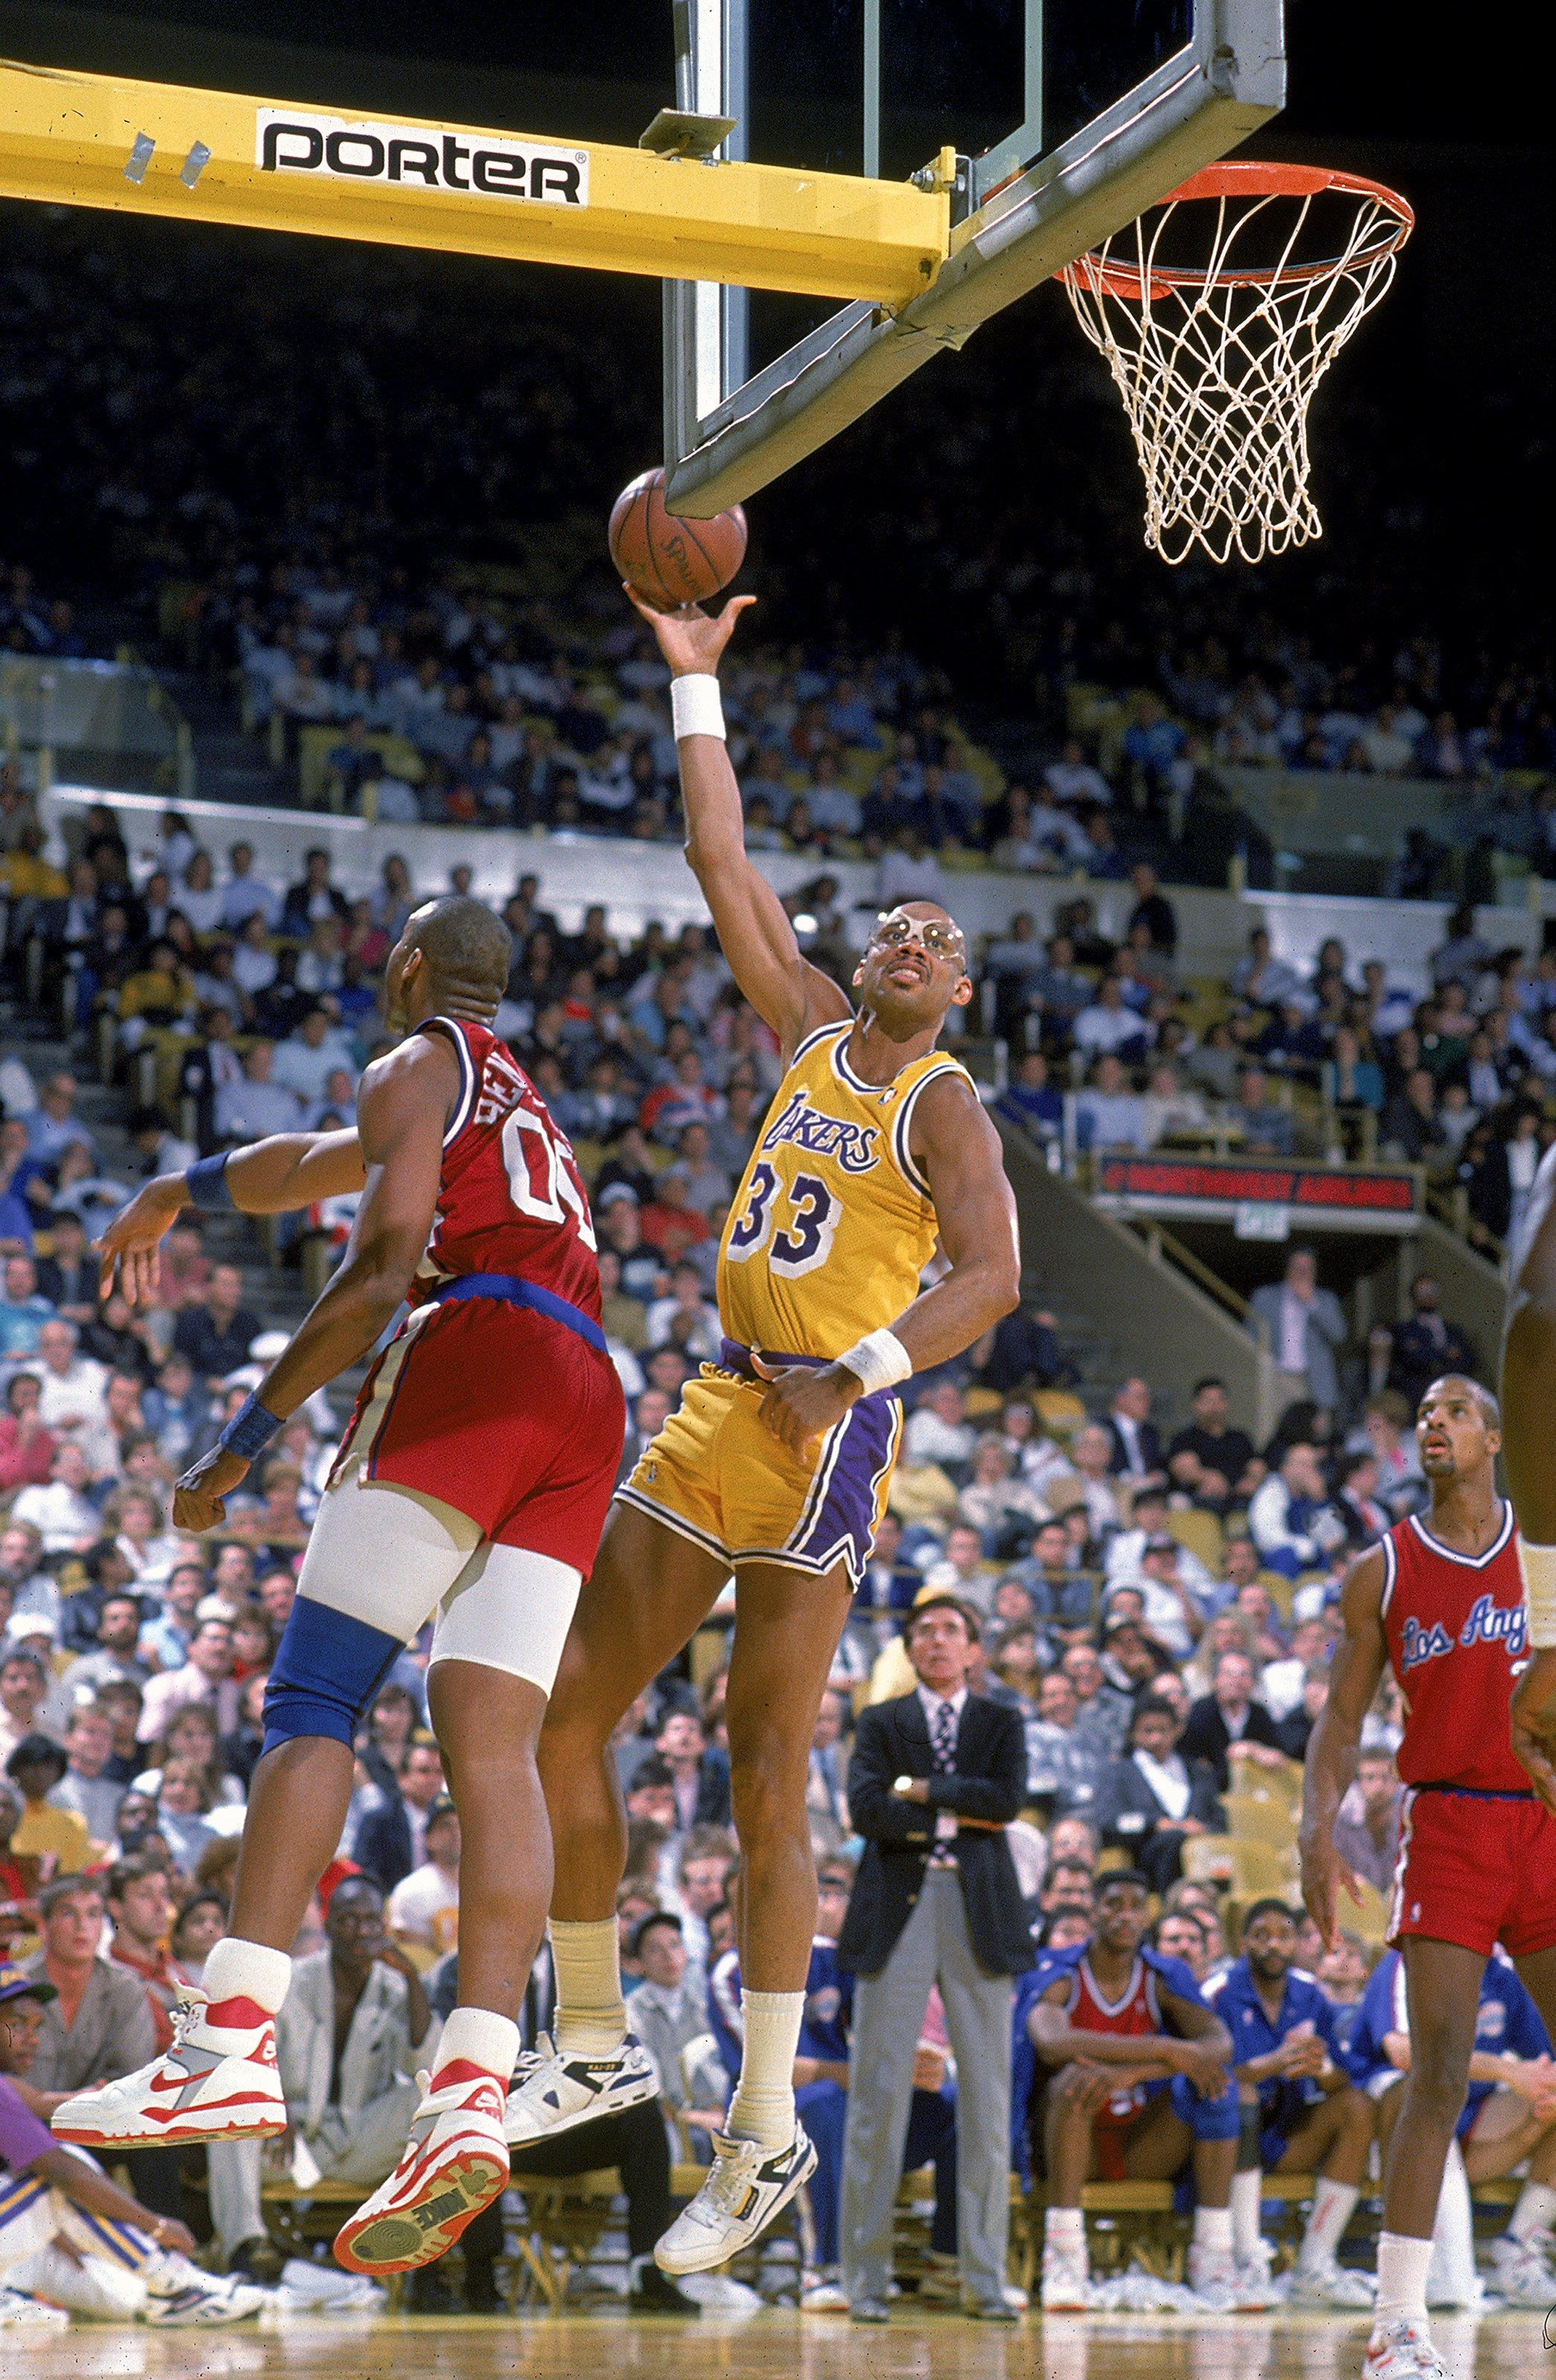 1989: Kareem Abdul- Jabbar of the Los Angeles Lakers makes a layup as Benoit Benjamin of the LA Clippers tries to block him.  Mandatory Credit: Stephen Dunn  /Allsport